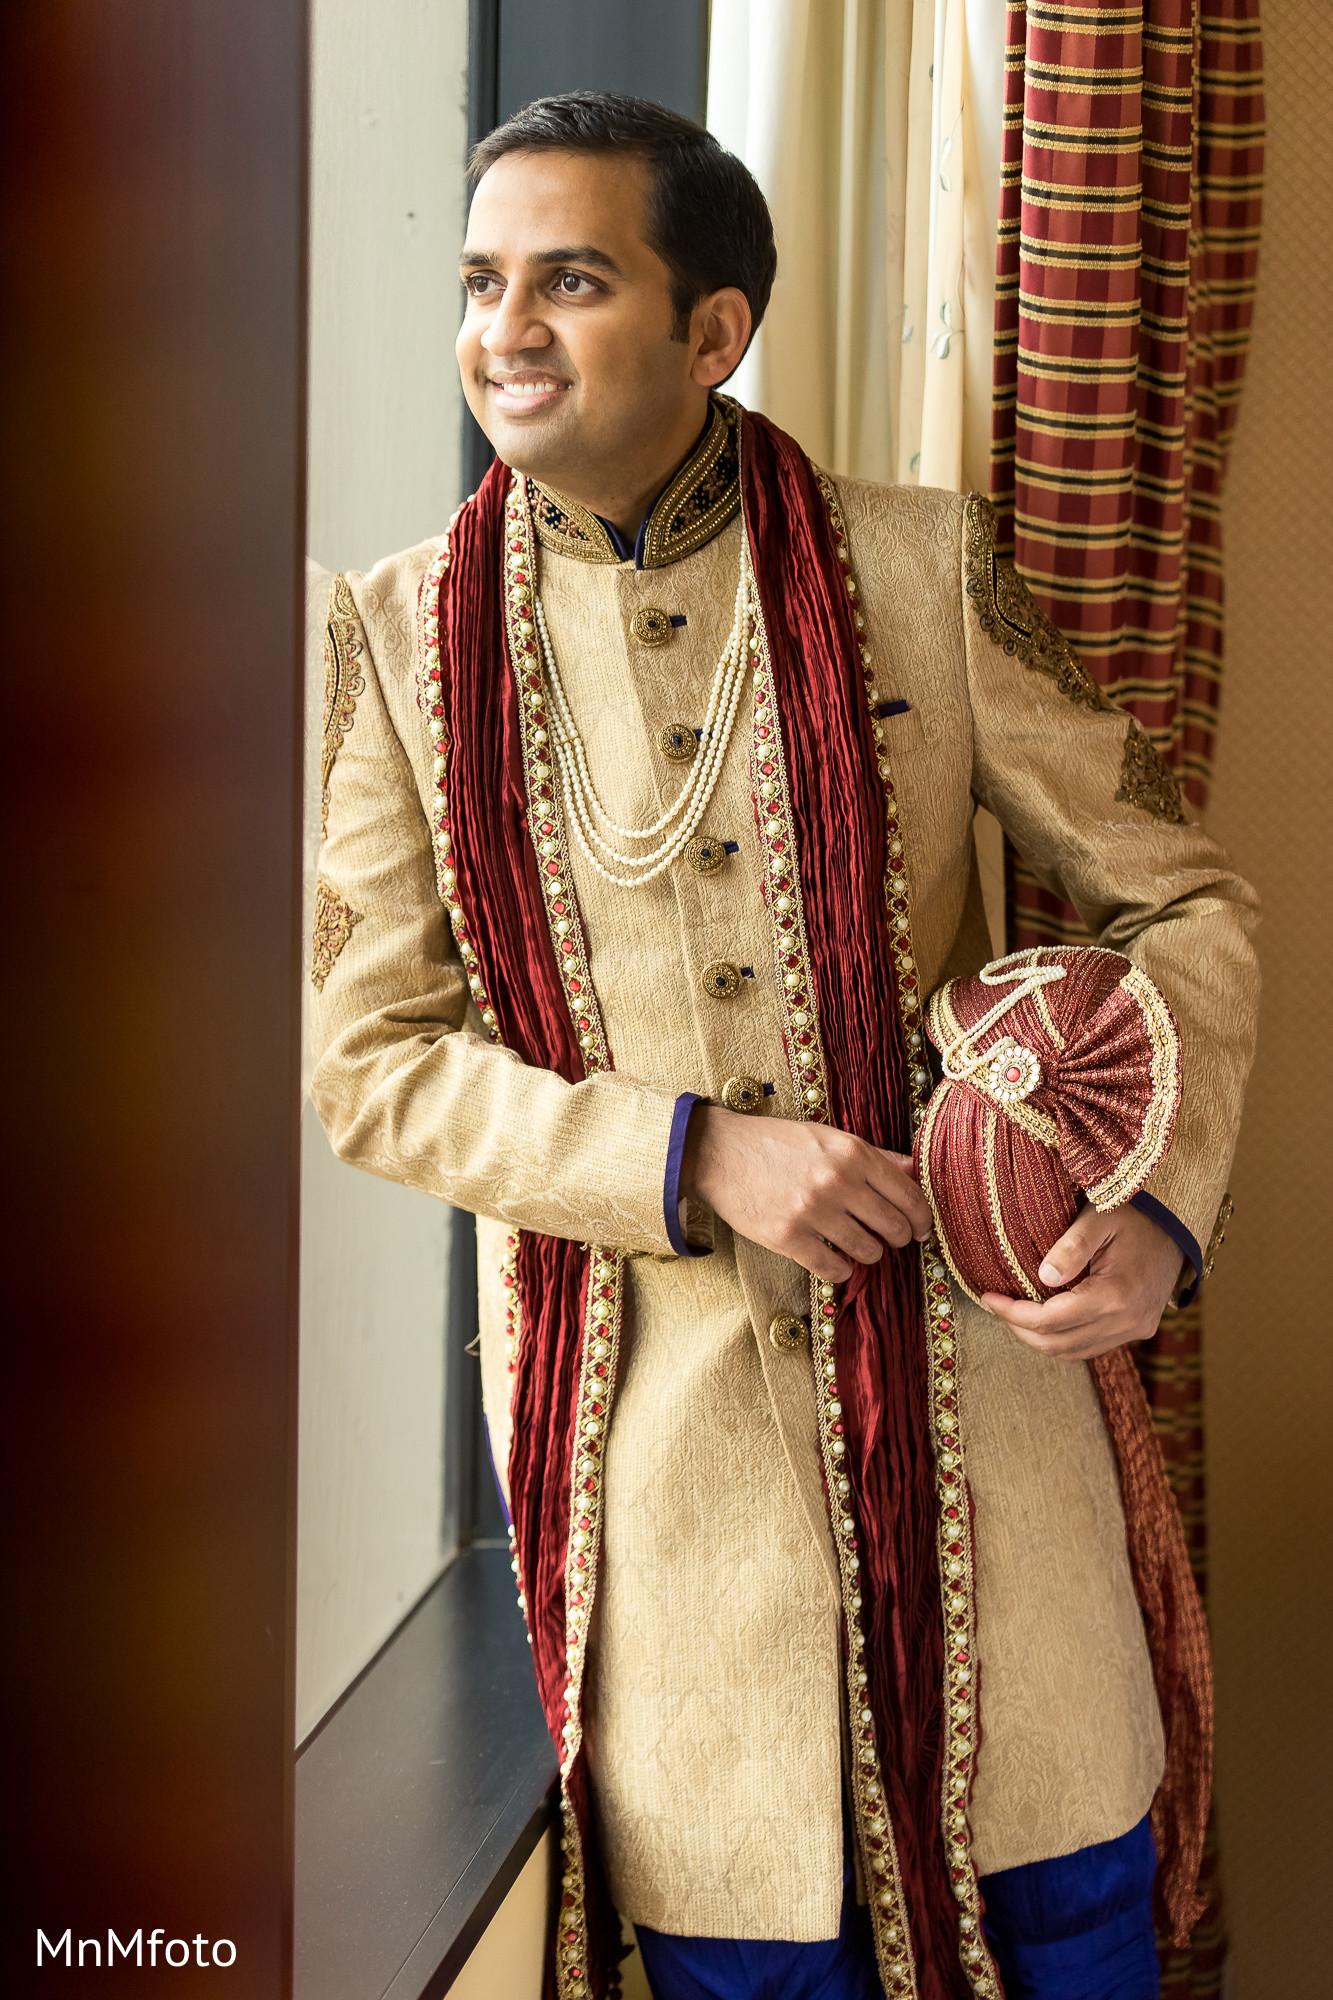 Groom Fashion In Forth Worth Tx Indian Wedding By Mnmfoto